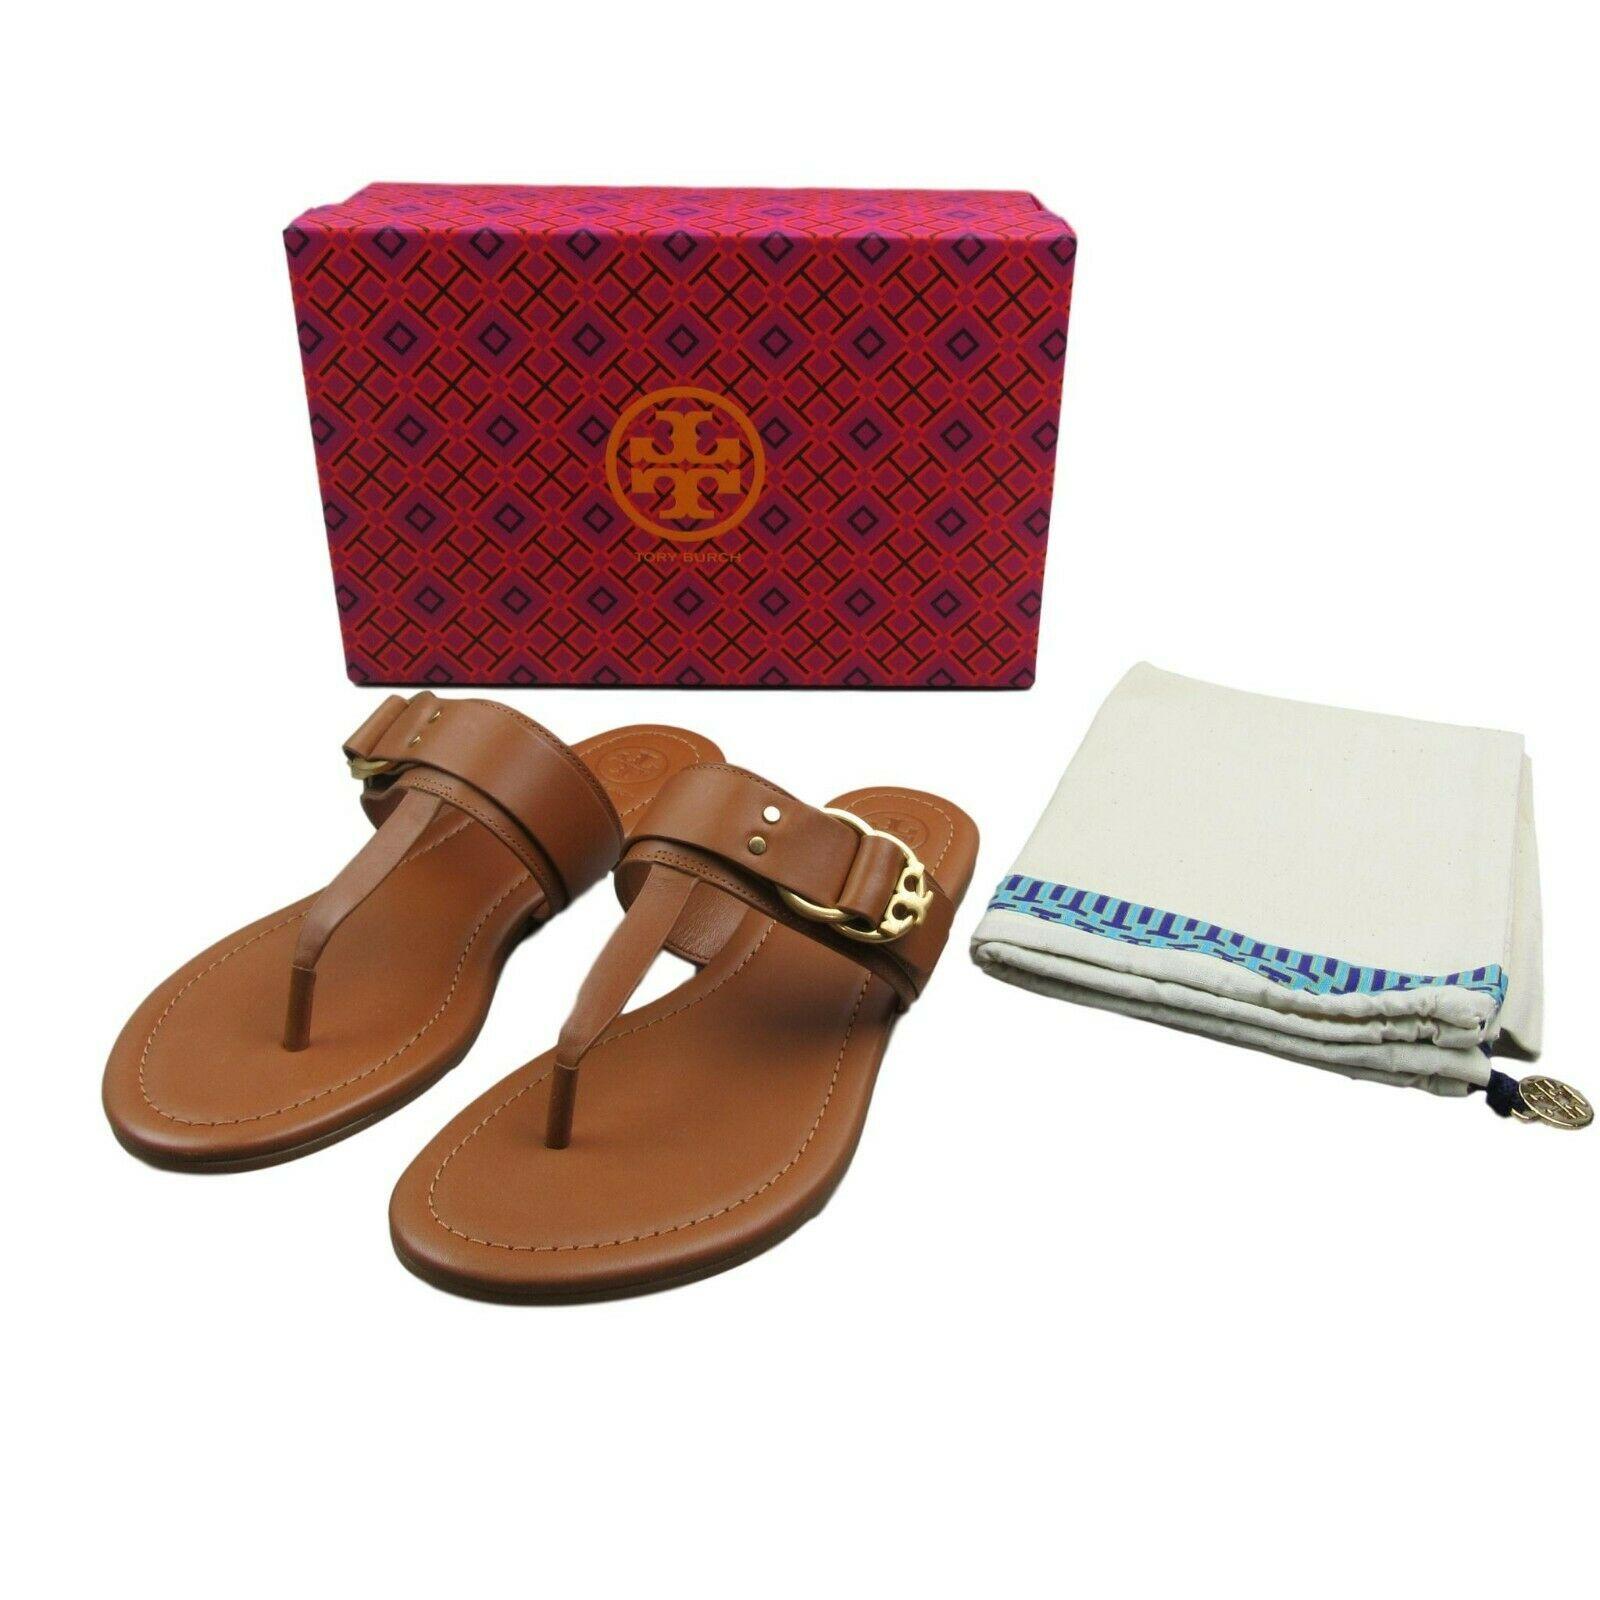 b7f119cbbe67 Tory Burch Marsden Flat Thong Sandal Size 8 Tan Leather  49357 New  228